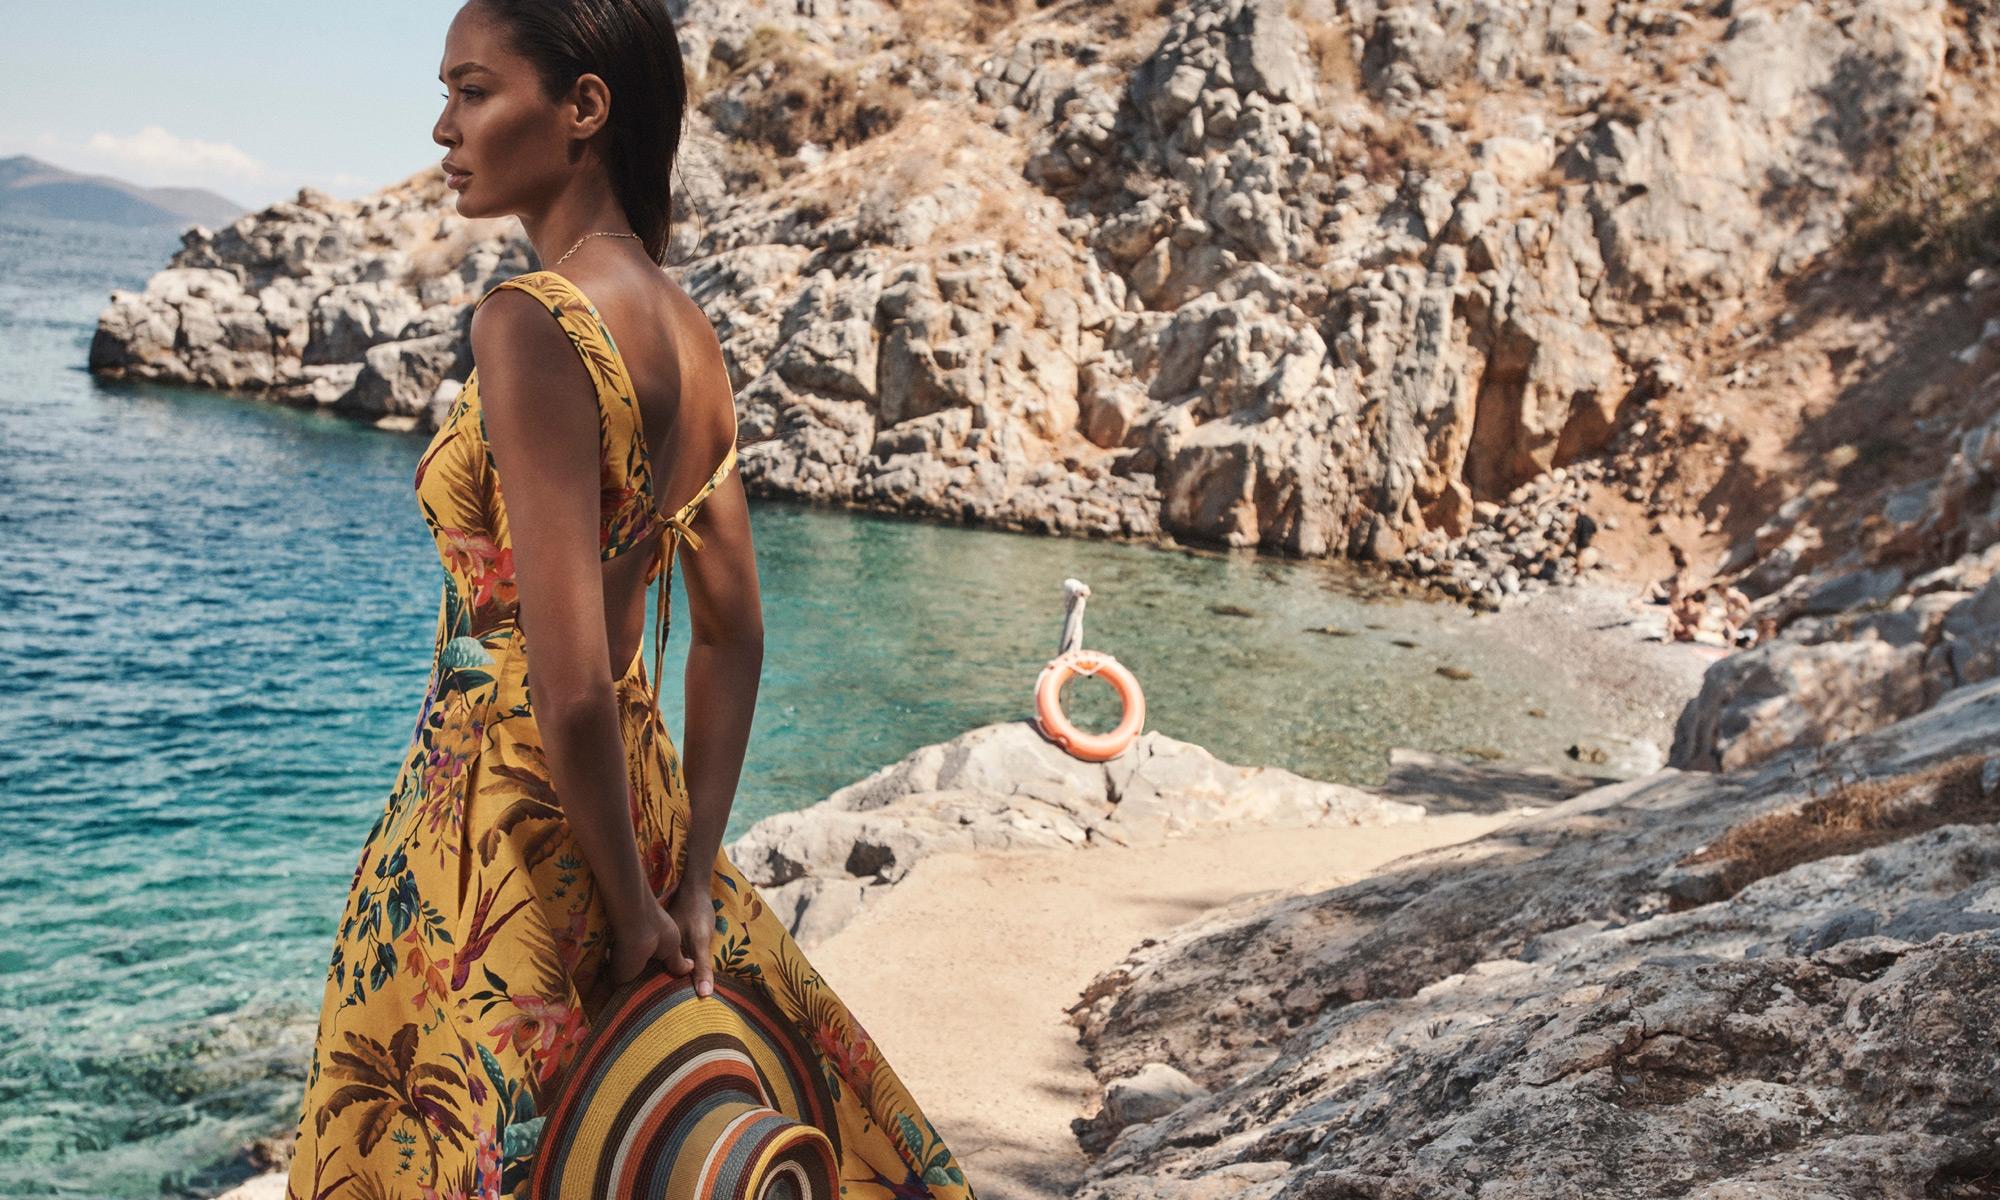 Tropicana Cut Out Midi Dress, Mango Floral, Double Chain Long Necklace, Gold, Stripe Sunhat, Multi